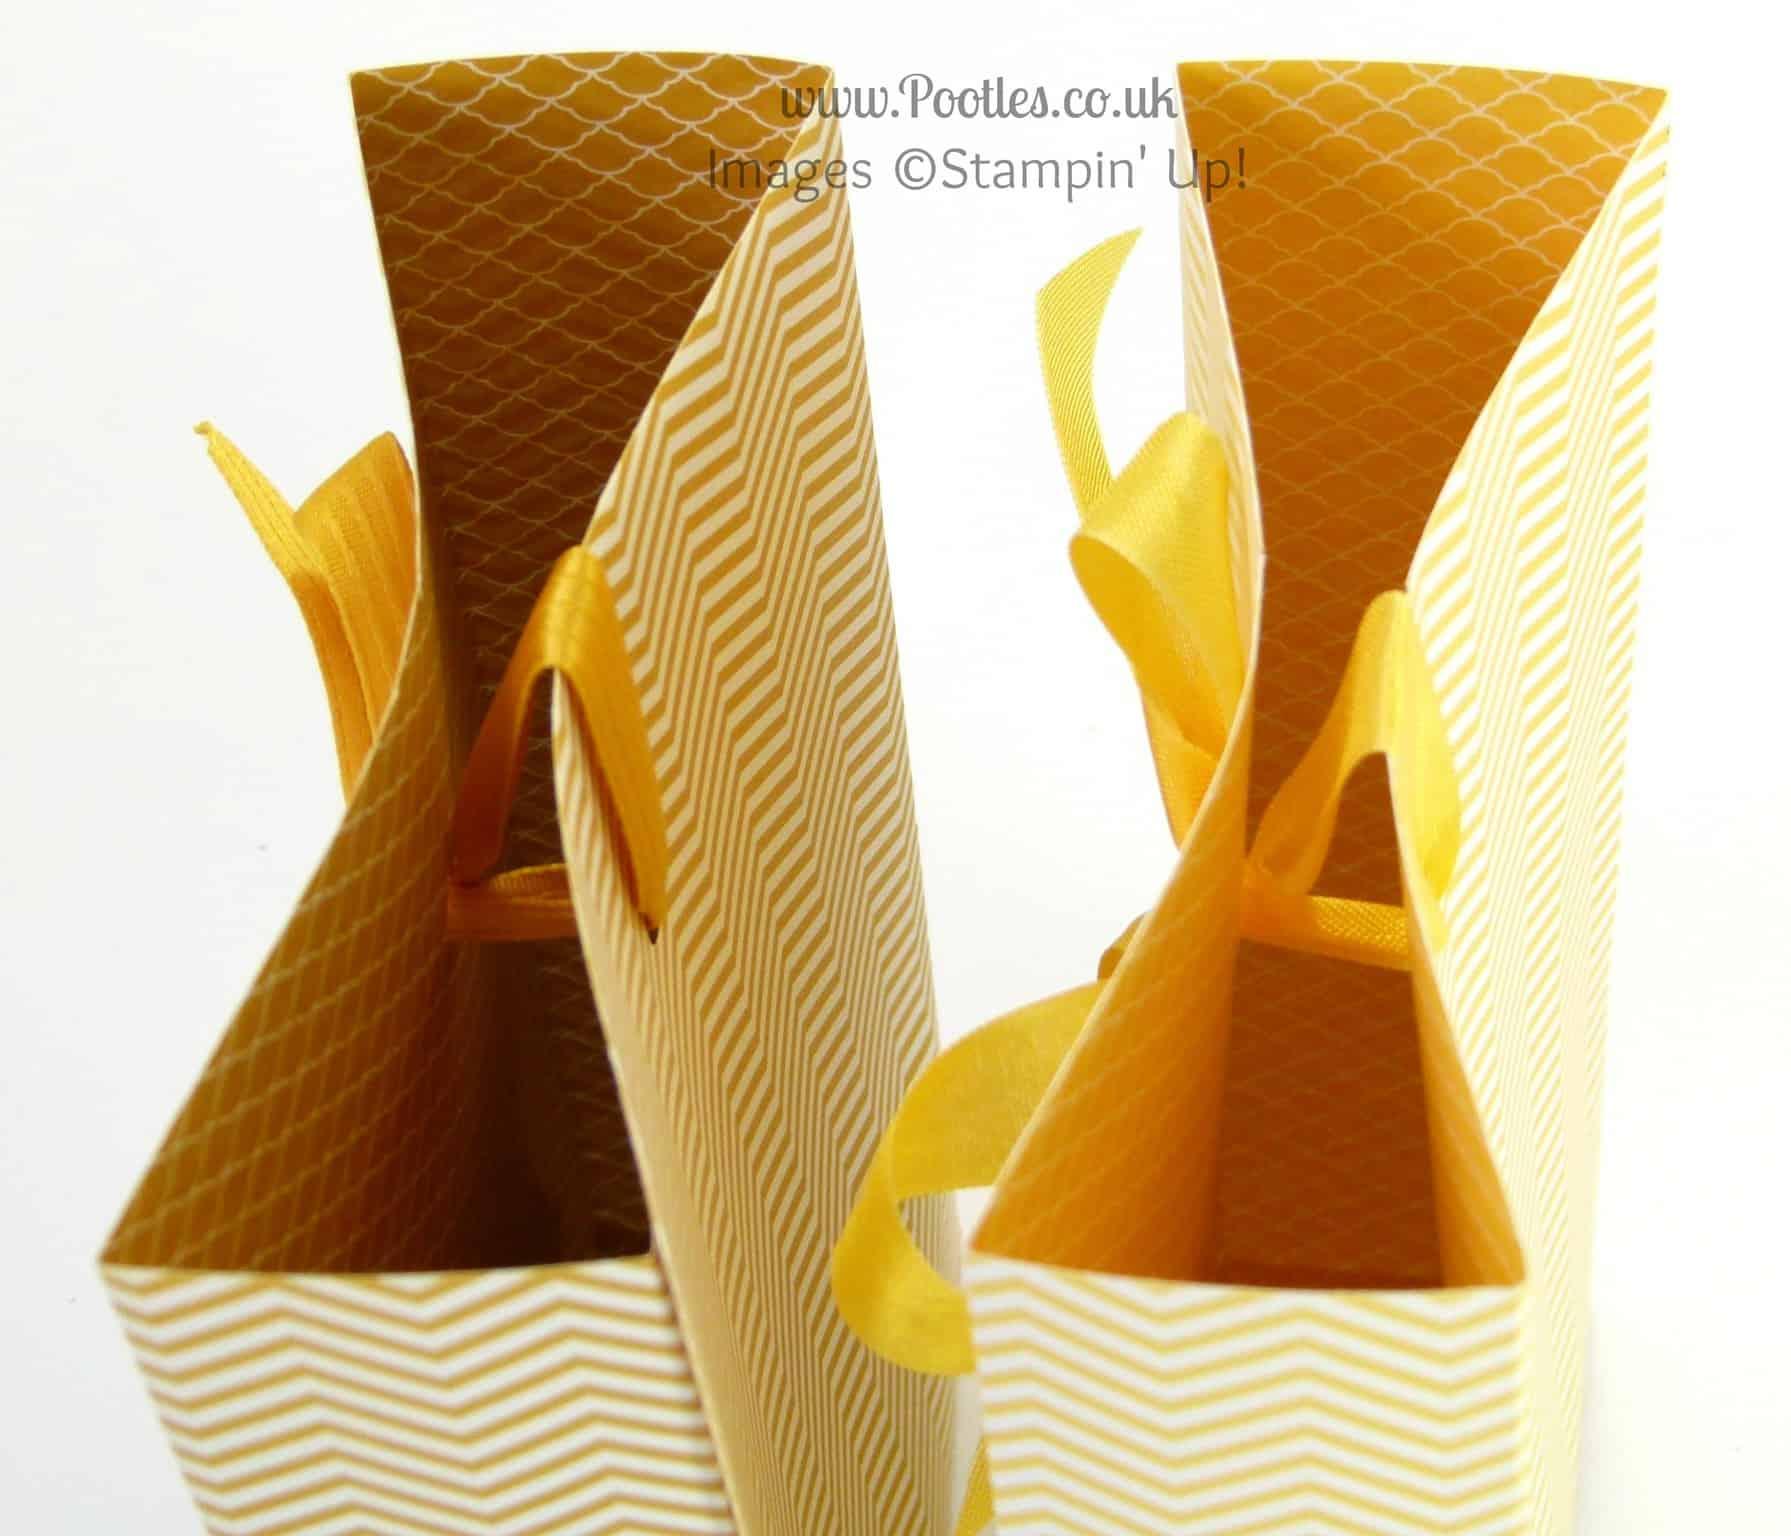 Stampin' Up! UK Demonstrator Pootles - Bee Happy Bag Tutorial close detail